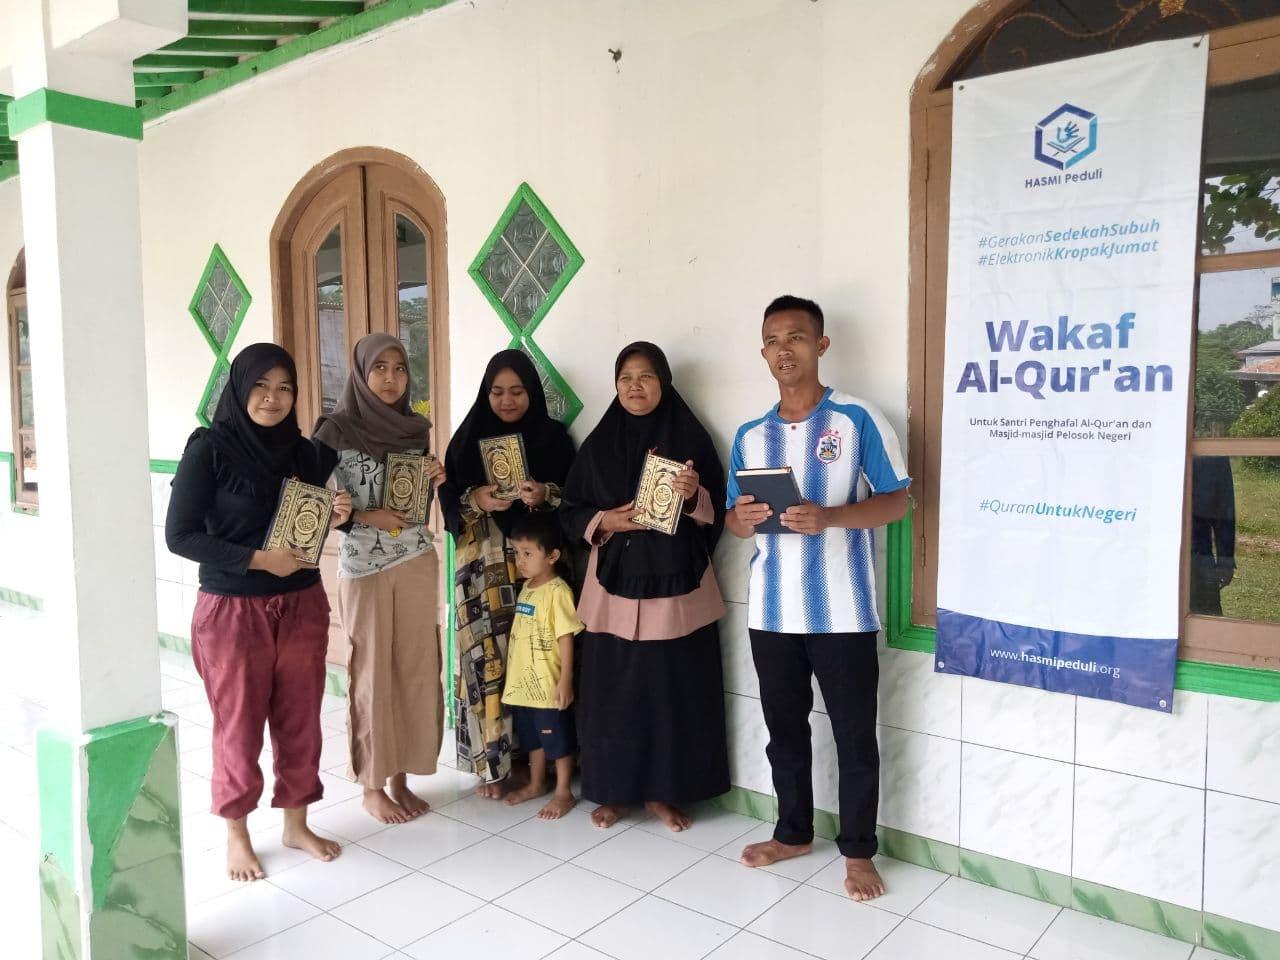 Wakaf Al-Qur'an untuk Majlis Ta'lim Al-Ikhlas Tenjolaya Kab. Bogor